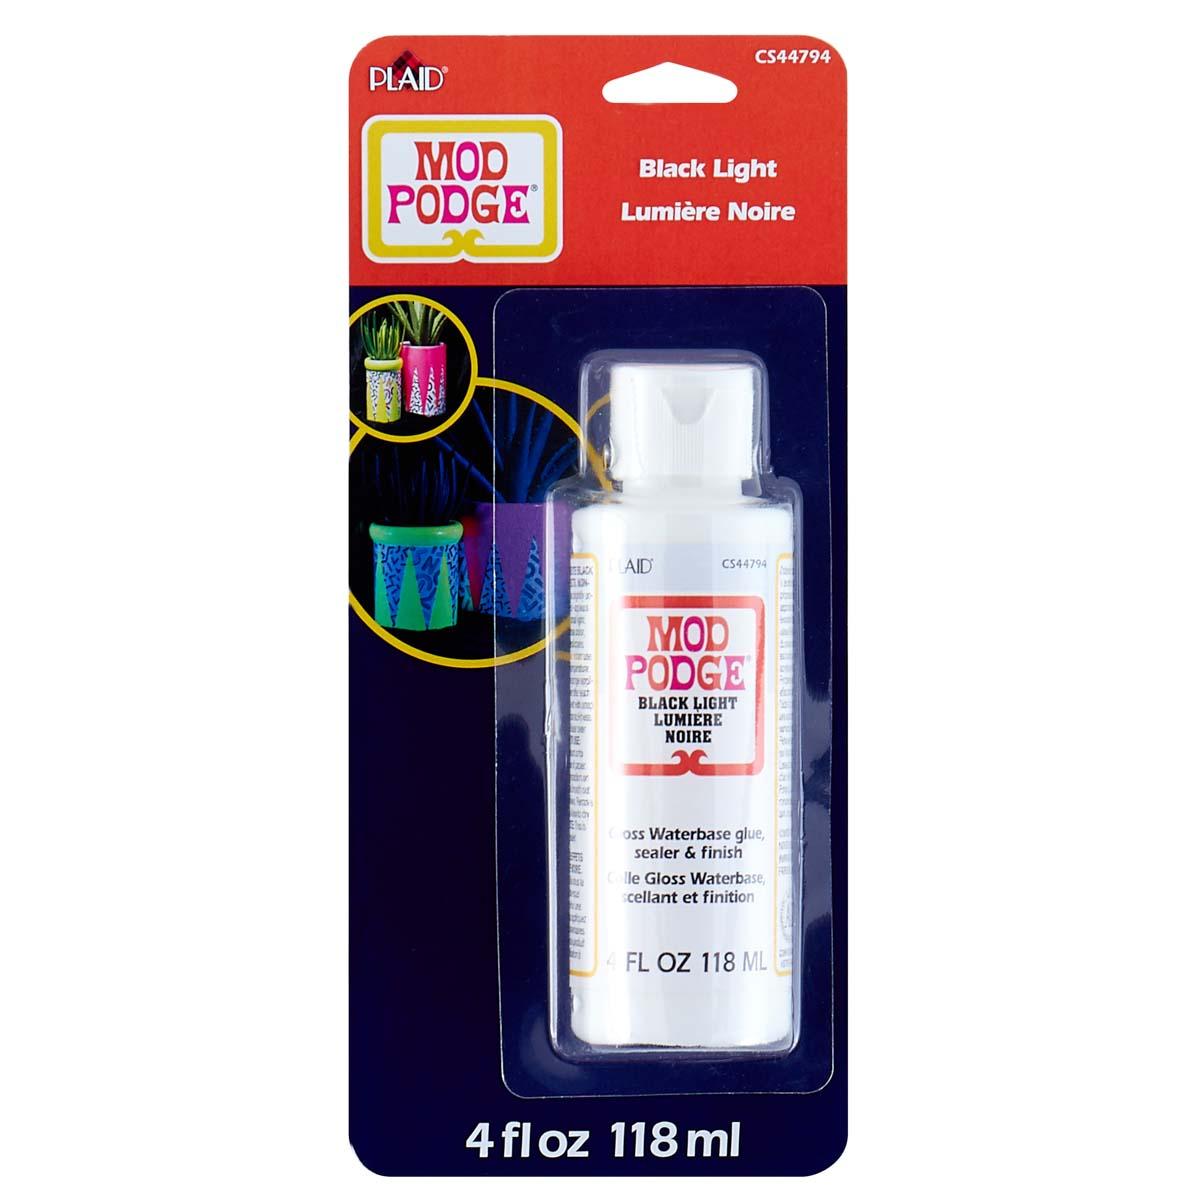 Mod Podge Blacklight Blue, 4 oz. - CS44794